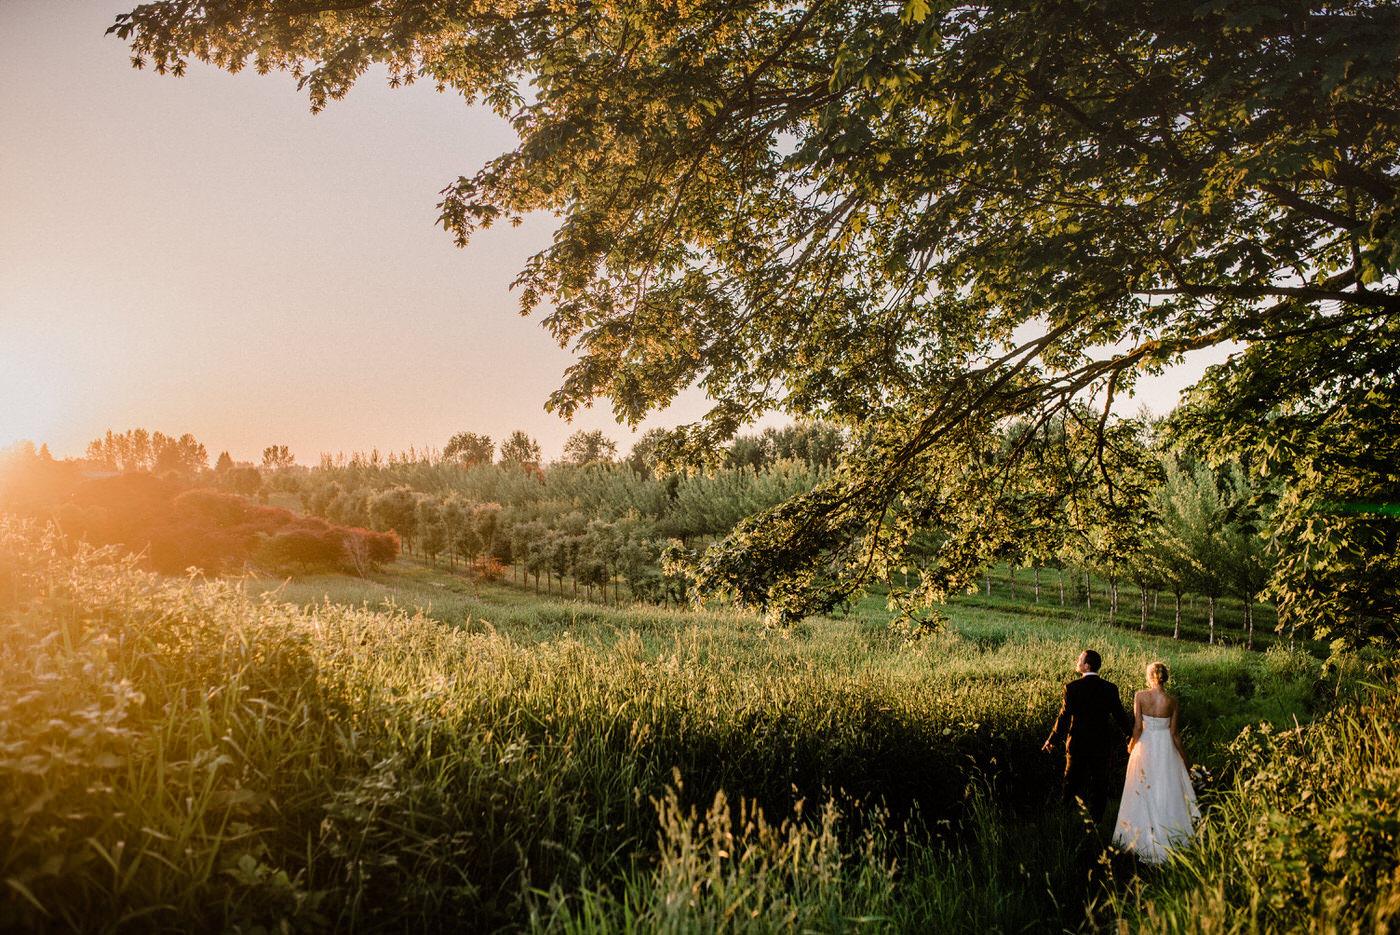 003-dairyland-farm-wedding-in-washington.jpg